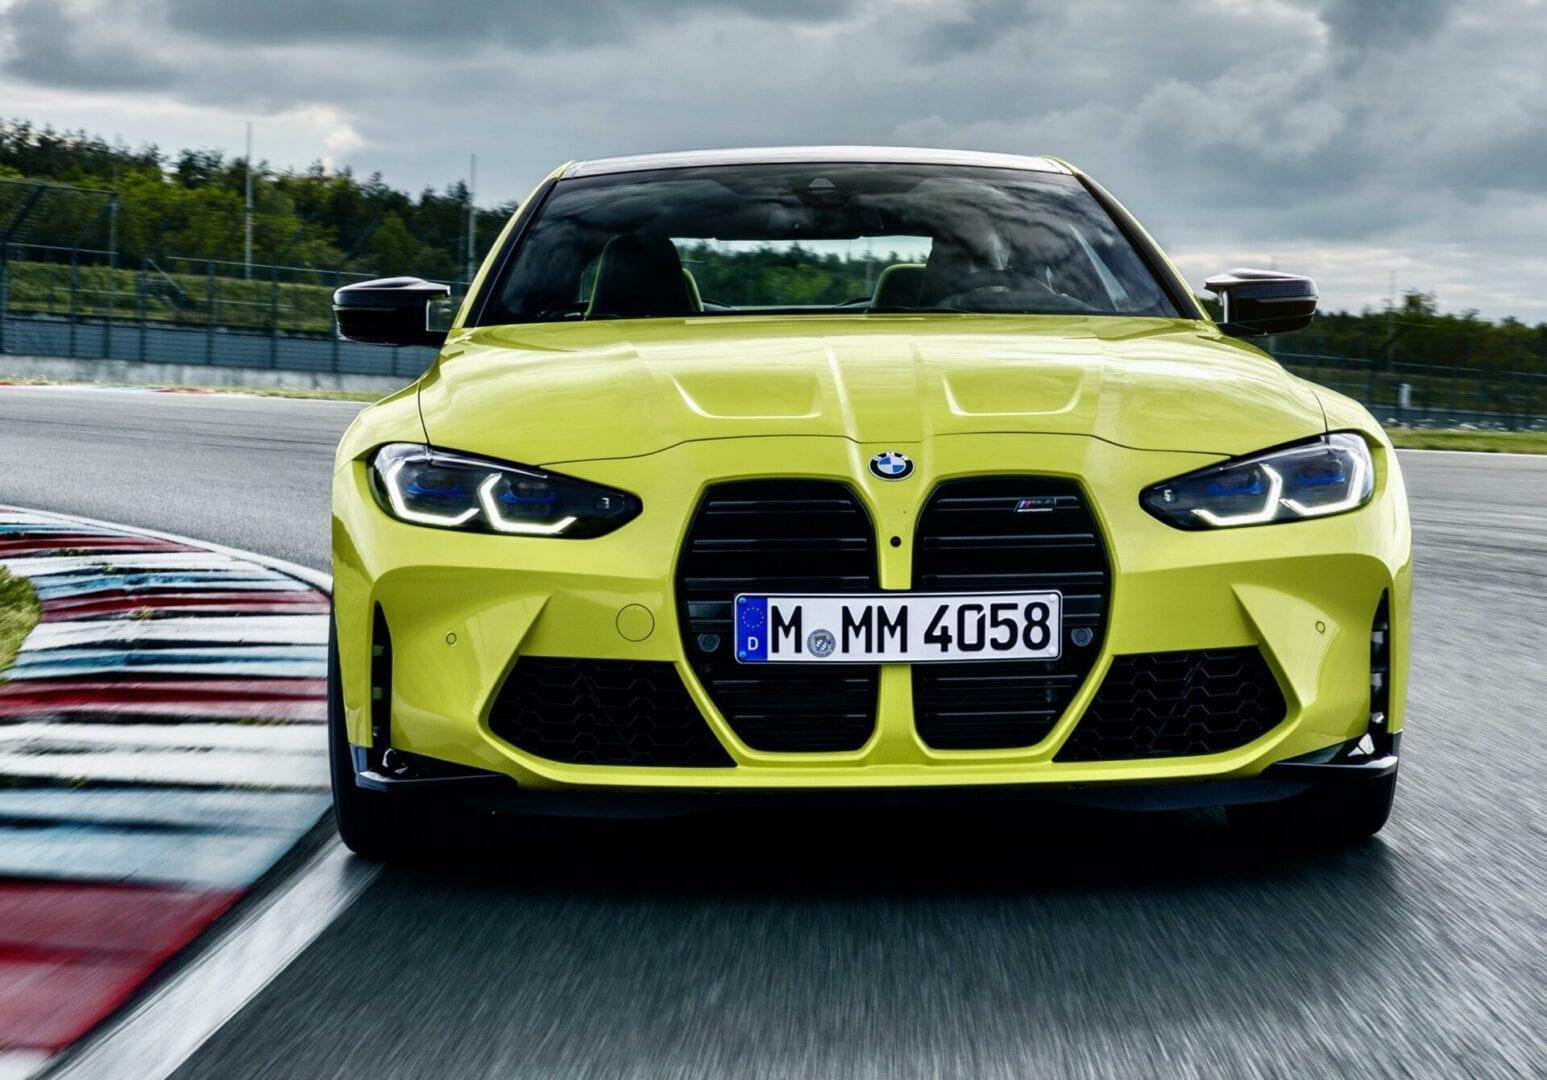 H νέα BMW M3 και Μ4 σε reviews